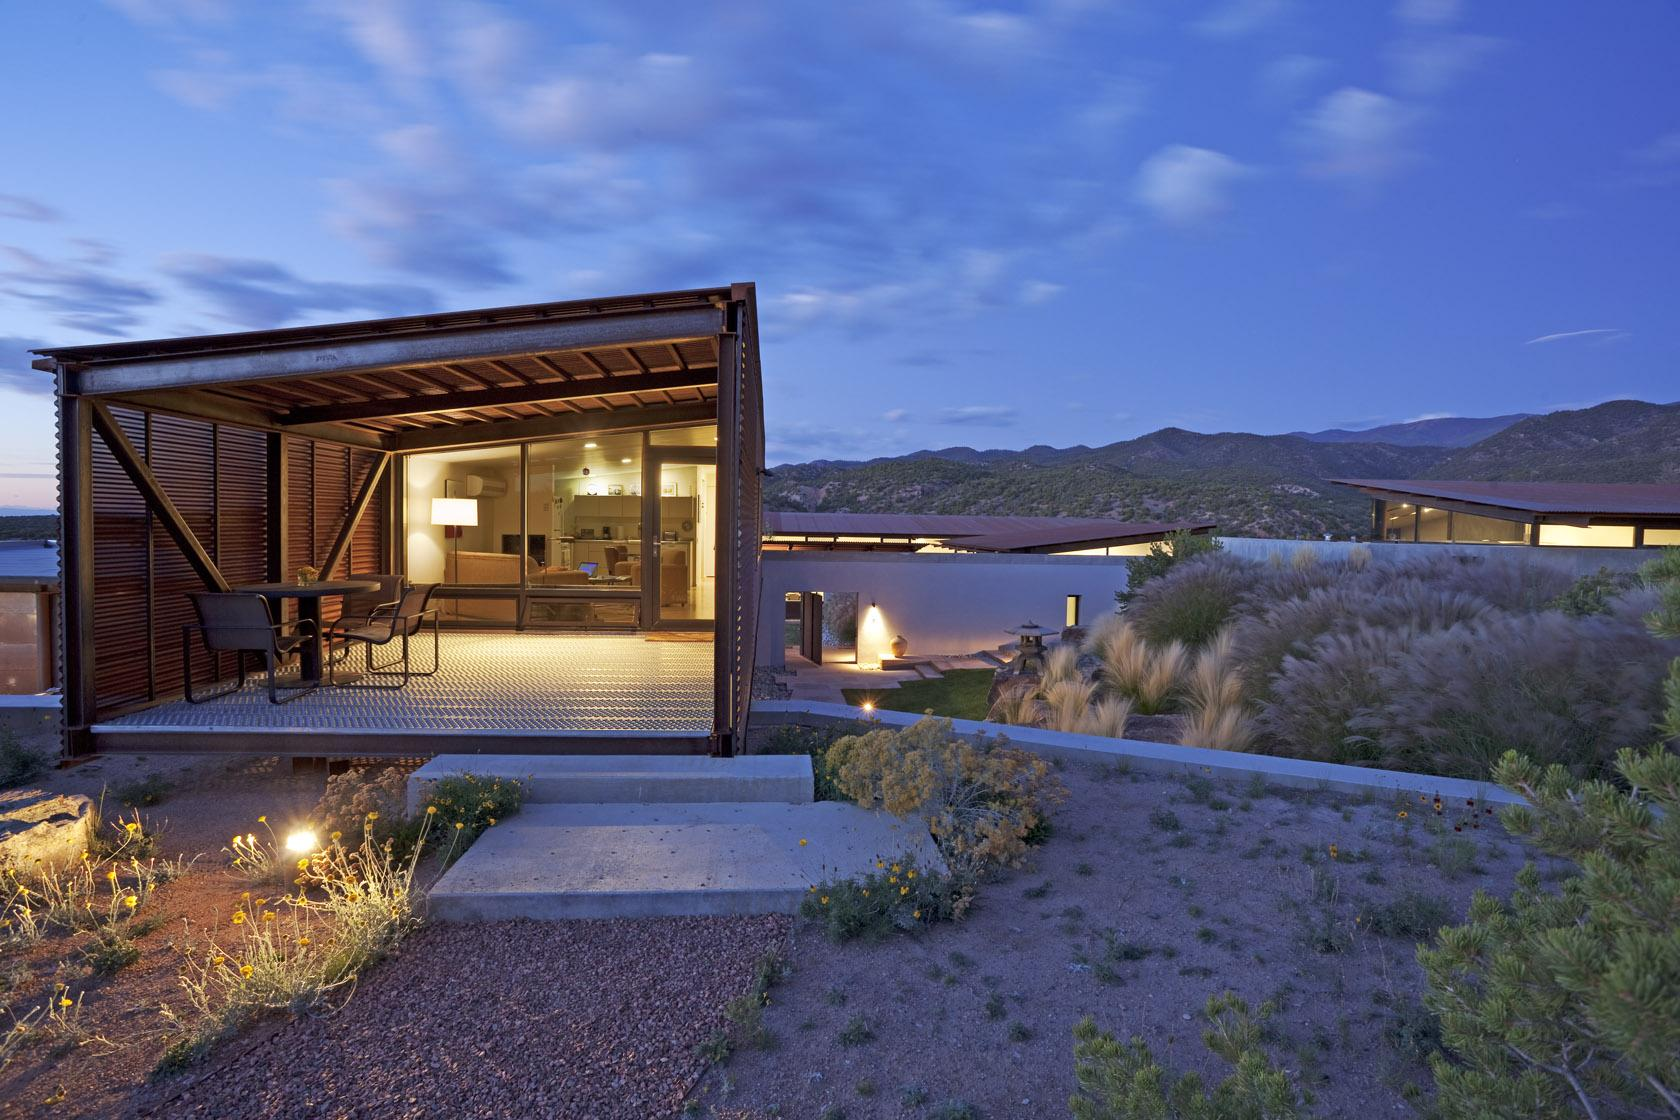 Interior design ideas modern architecture house designs for Santa fe home design